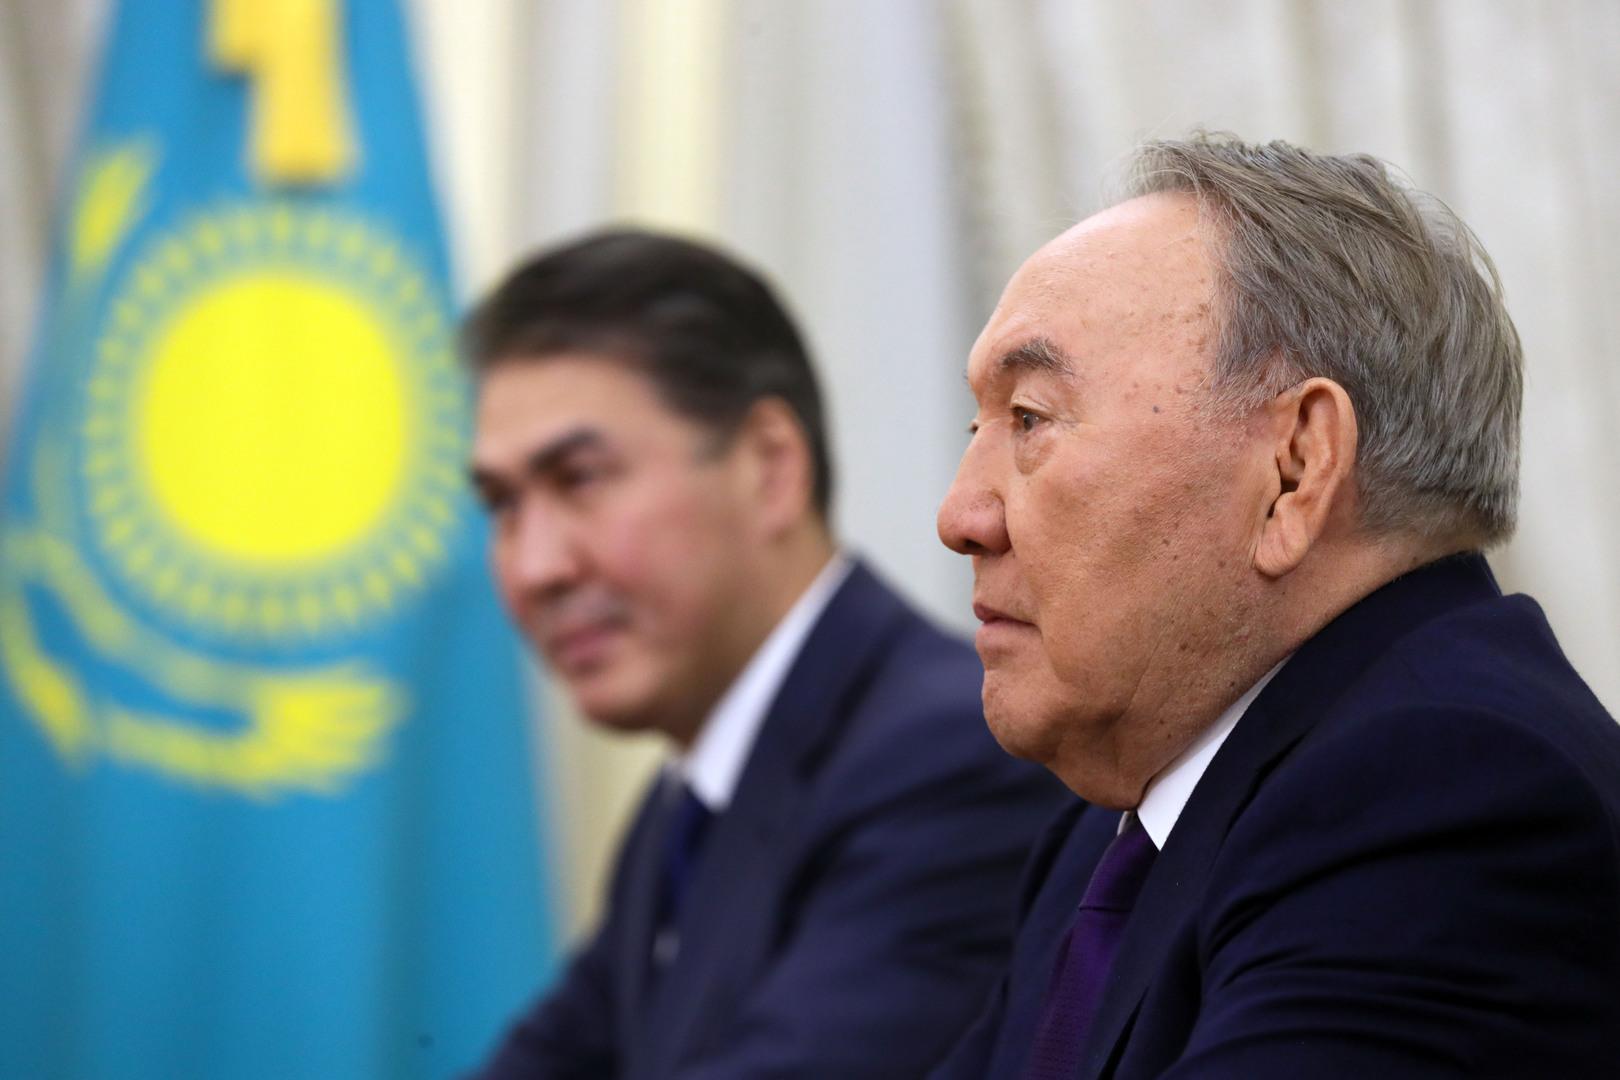 إصابة رئيس كازاخستان السابق نور سلطان نزارباييف بالفيروس التاجي